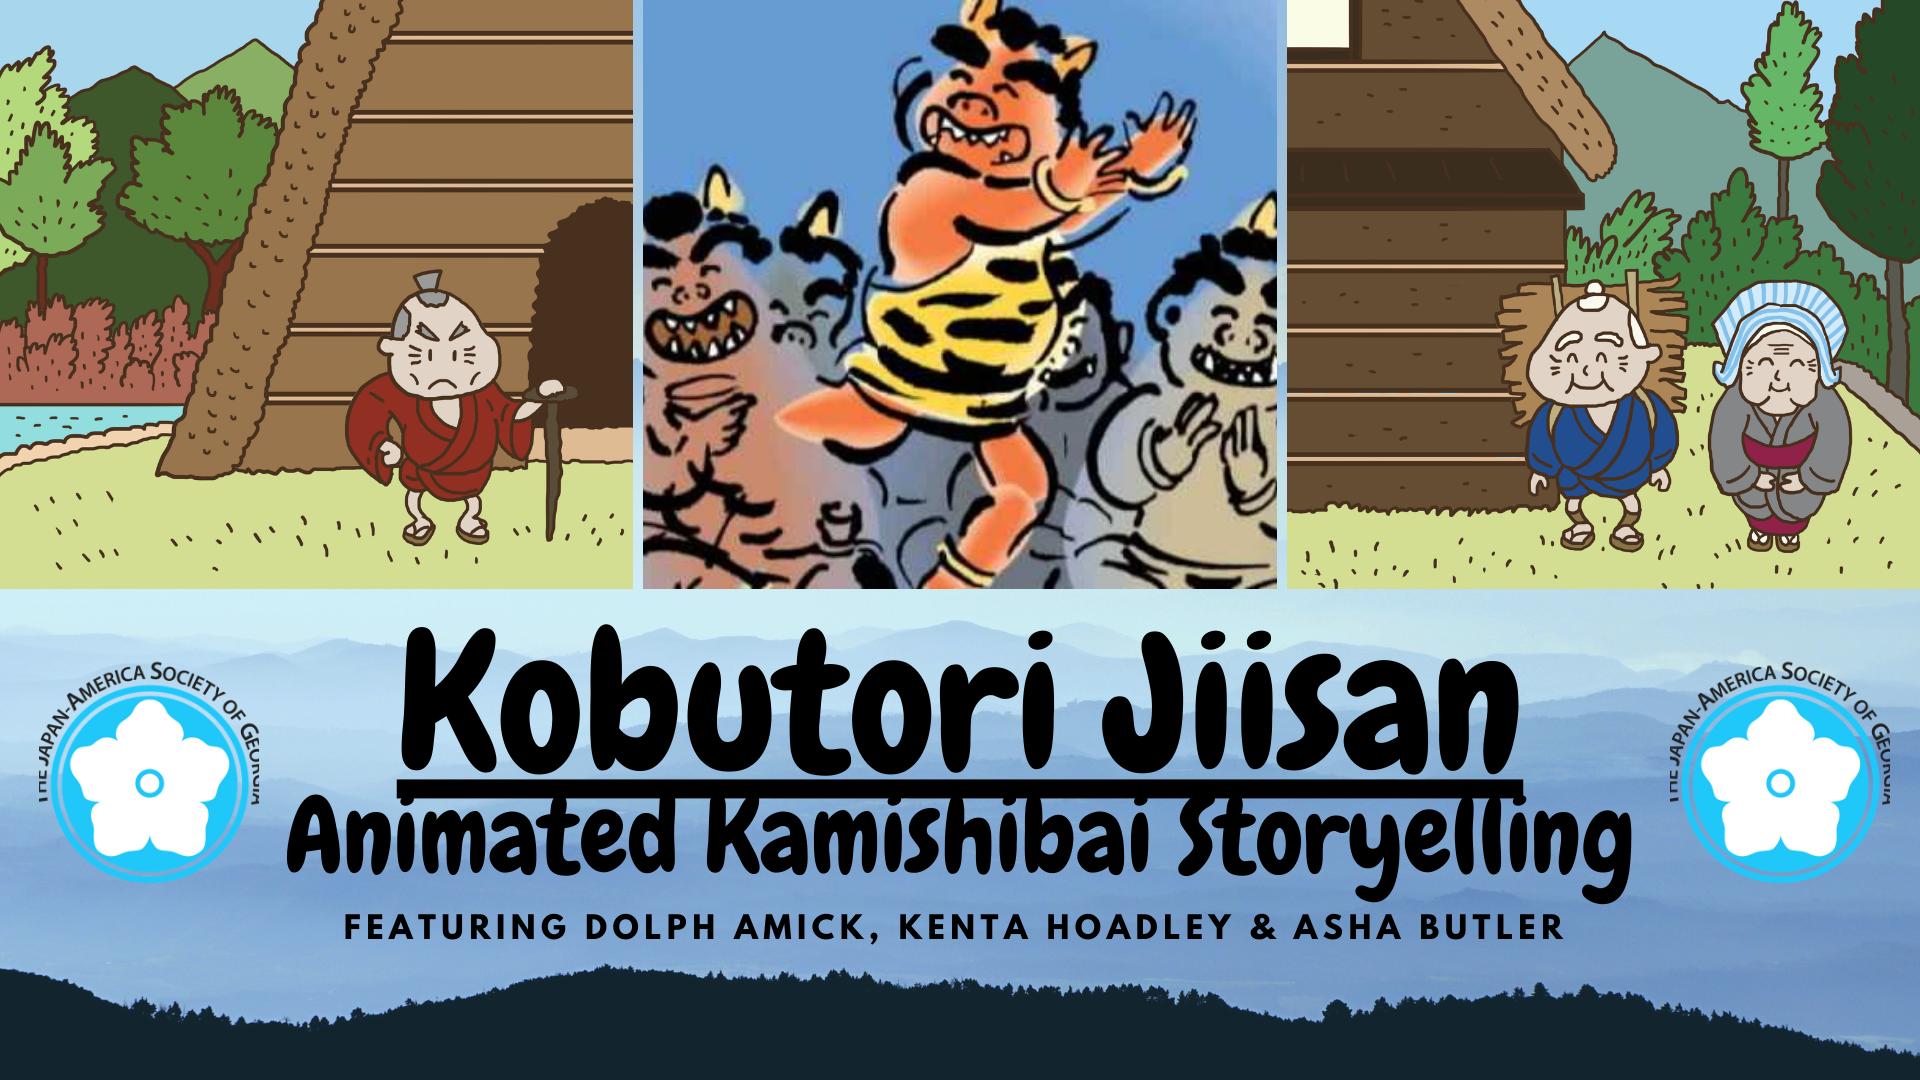 Digital Kamishibai Anime Storytelling of Kobutori Jiisan